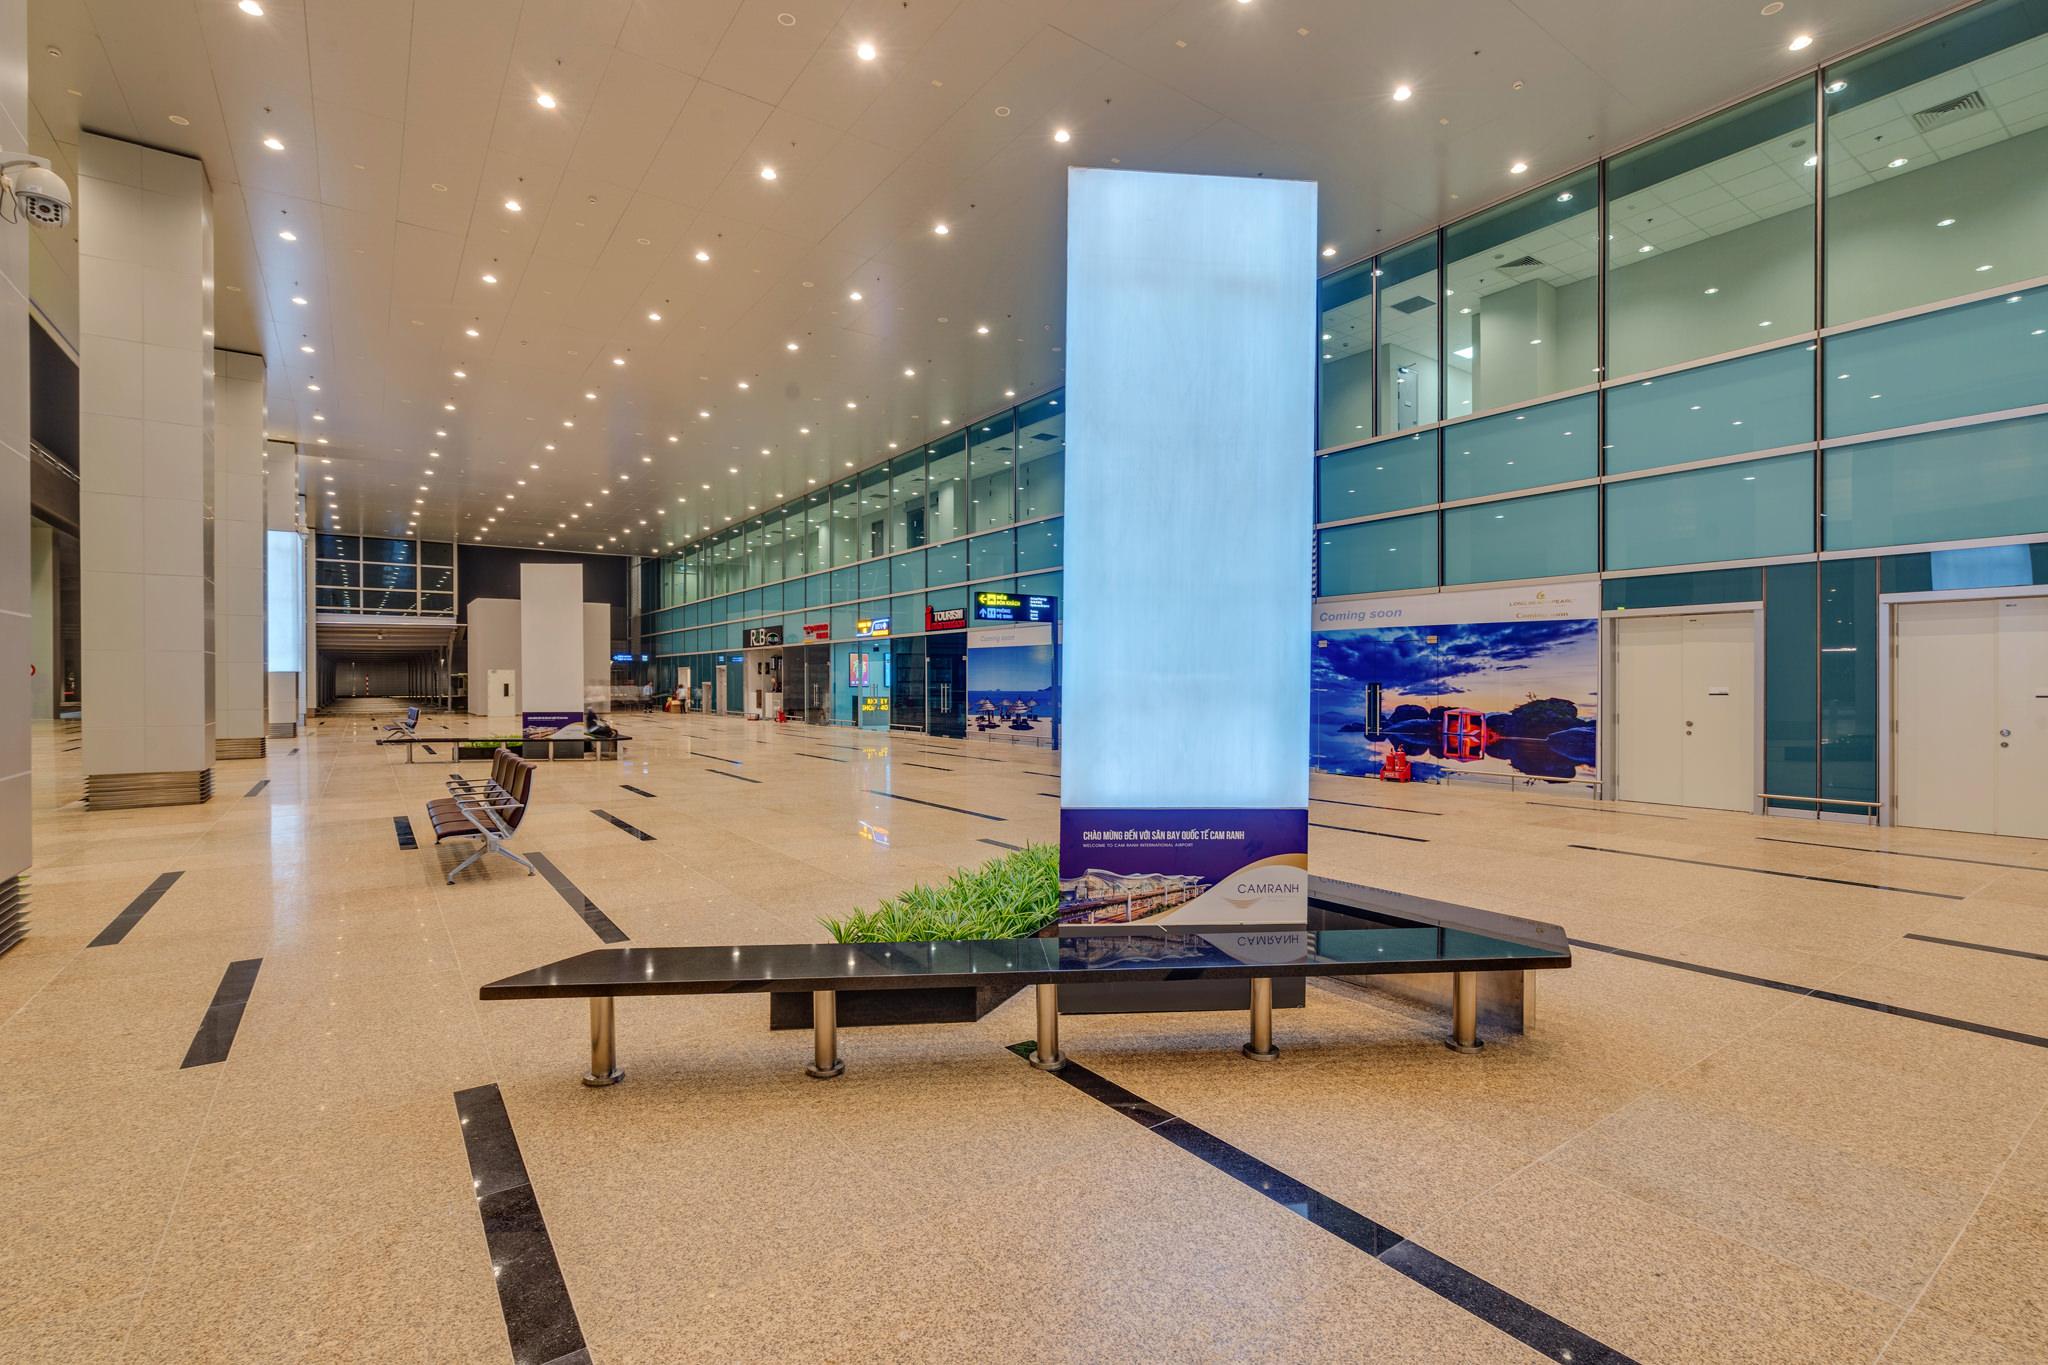 20180626 - Cam Ranh Airport - Architecture - 0426.jpg